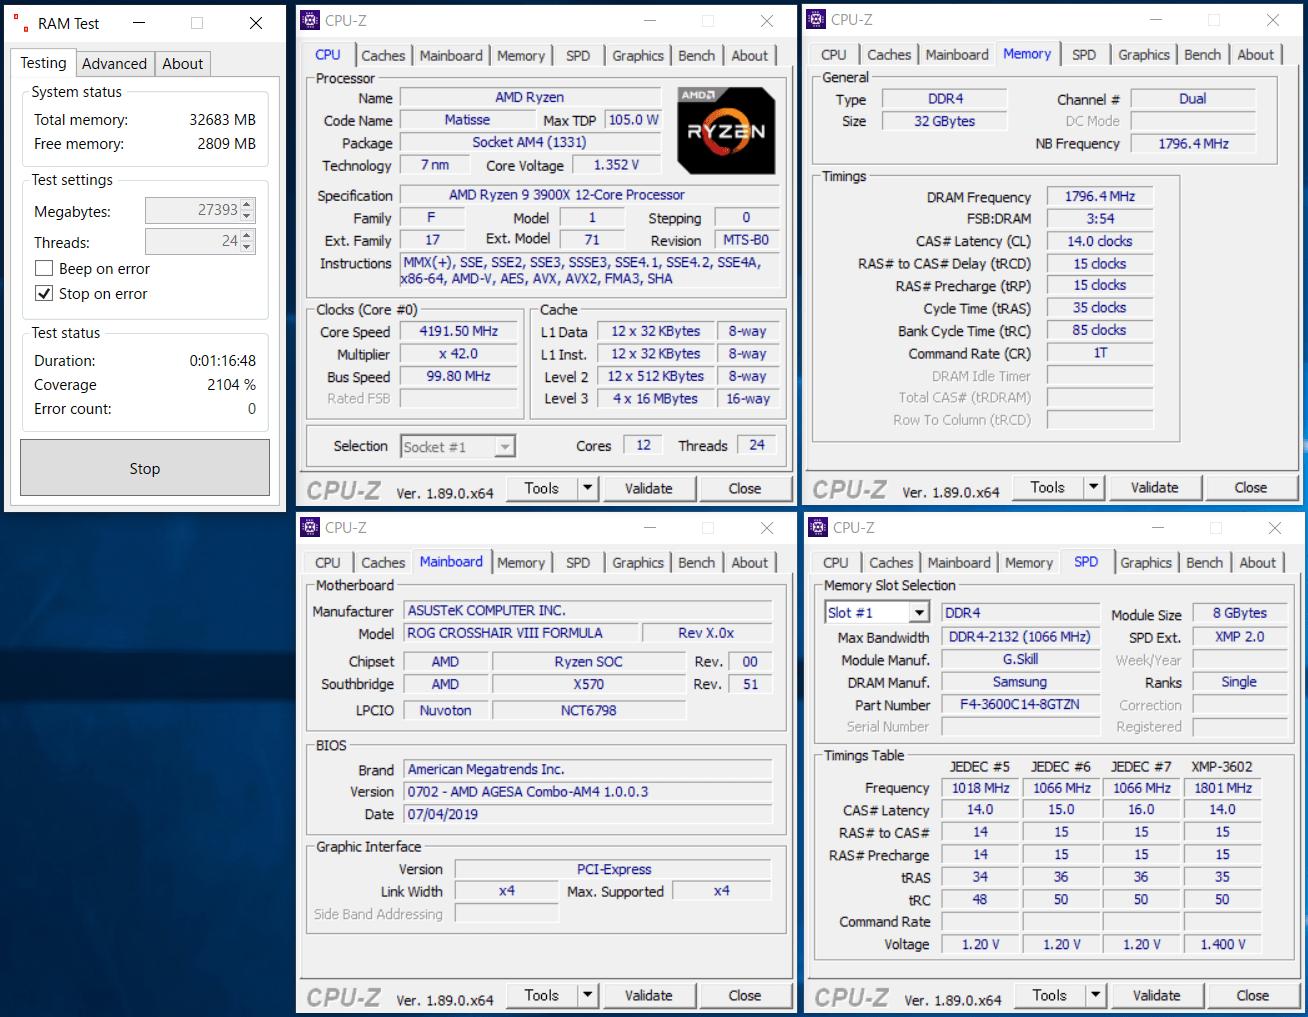 F4-3600C14Q-32GTZN_ASUS ROG CROSSHAIR VIII FORMULA_RAM Test